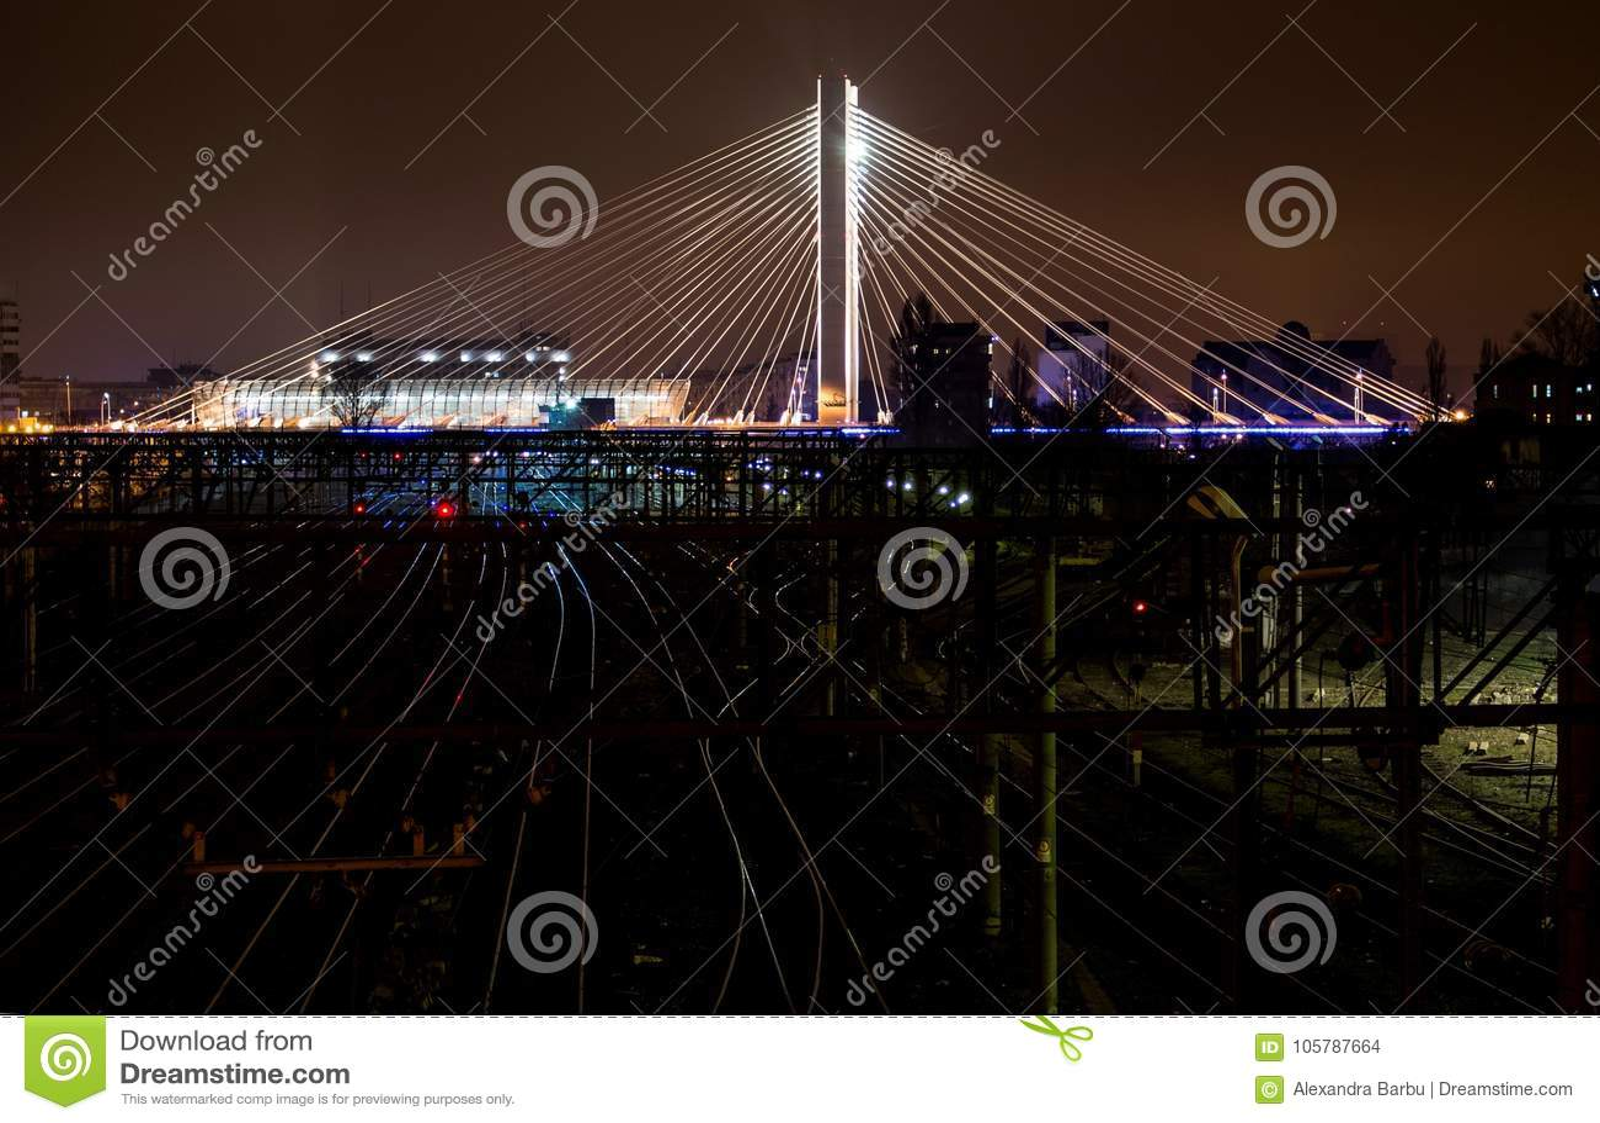 Illuminated Suspended bridge over railway urban modern landmark city night scene